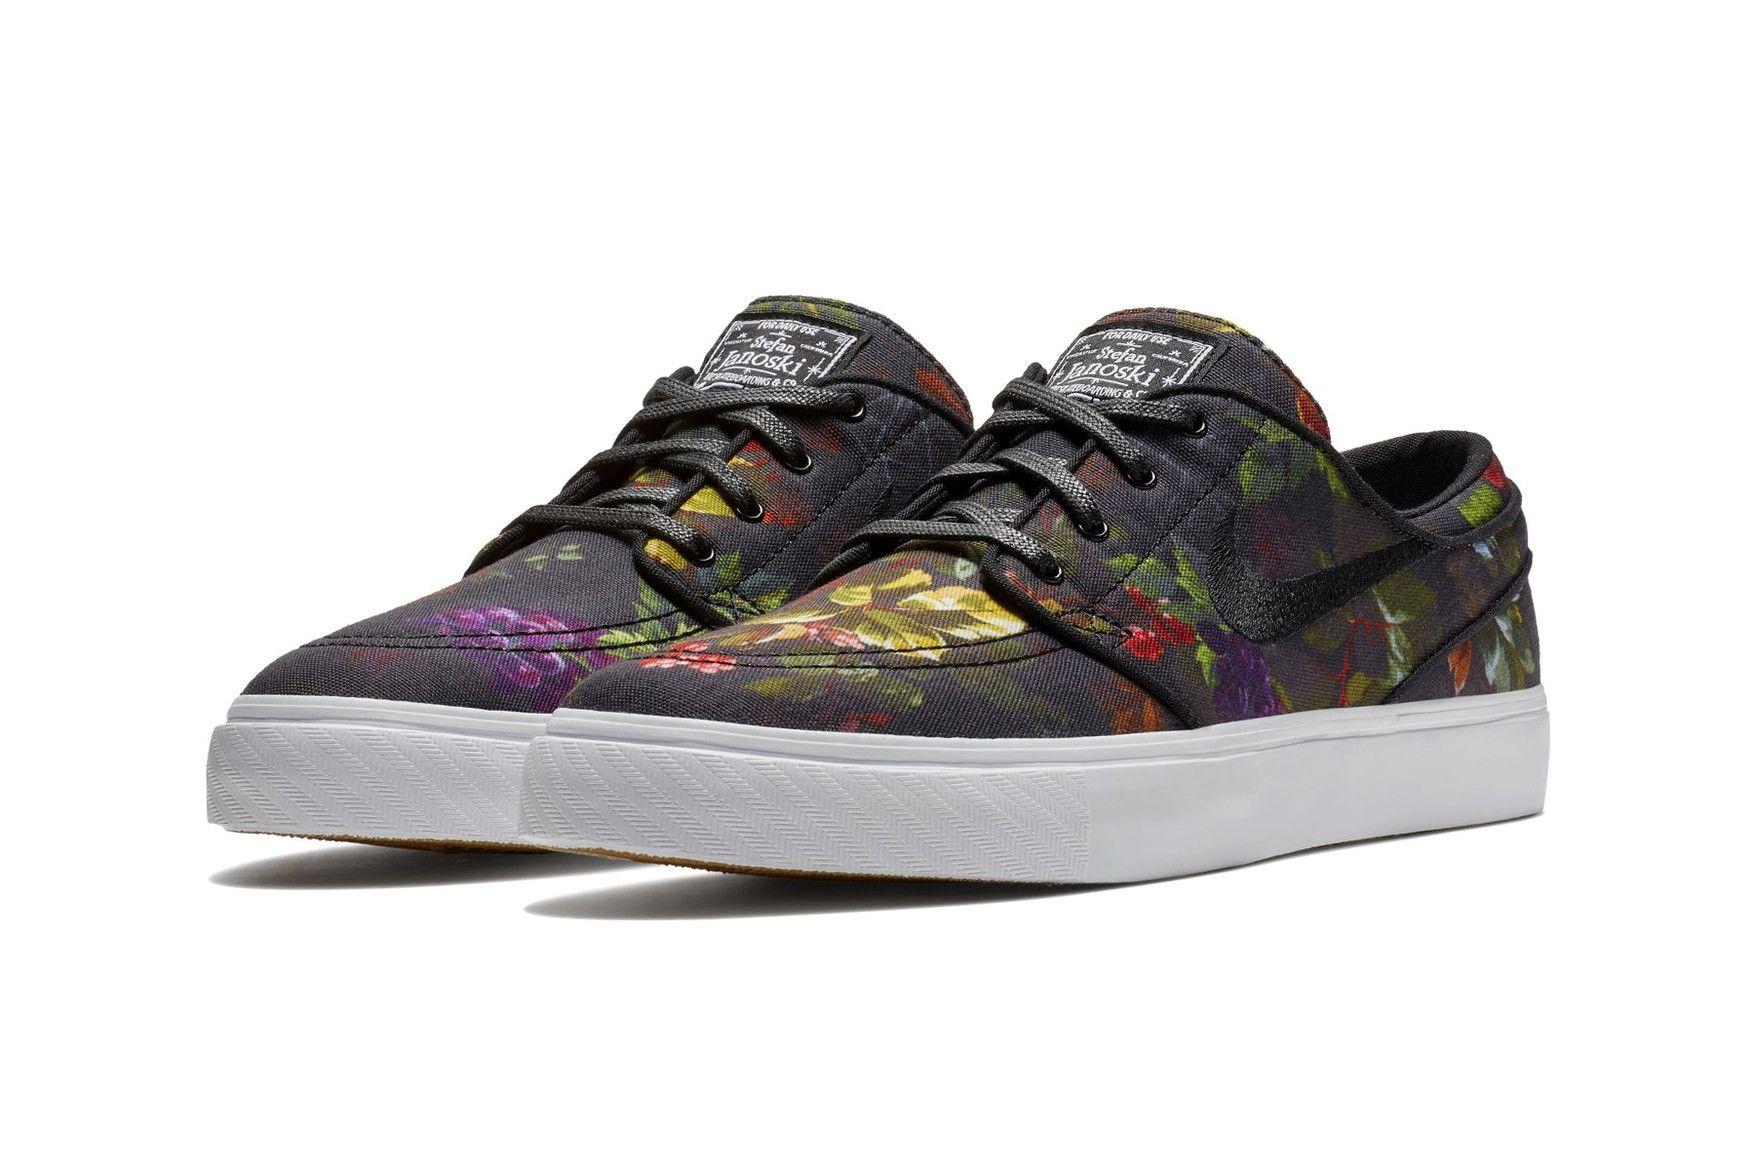 Nike SB Zoom Stefan Janoski Floral Canvas Release Date sneaker price  skateboarding 4ab50ef08